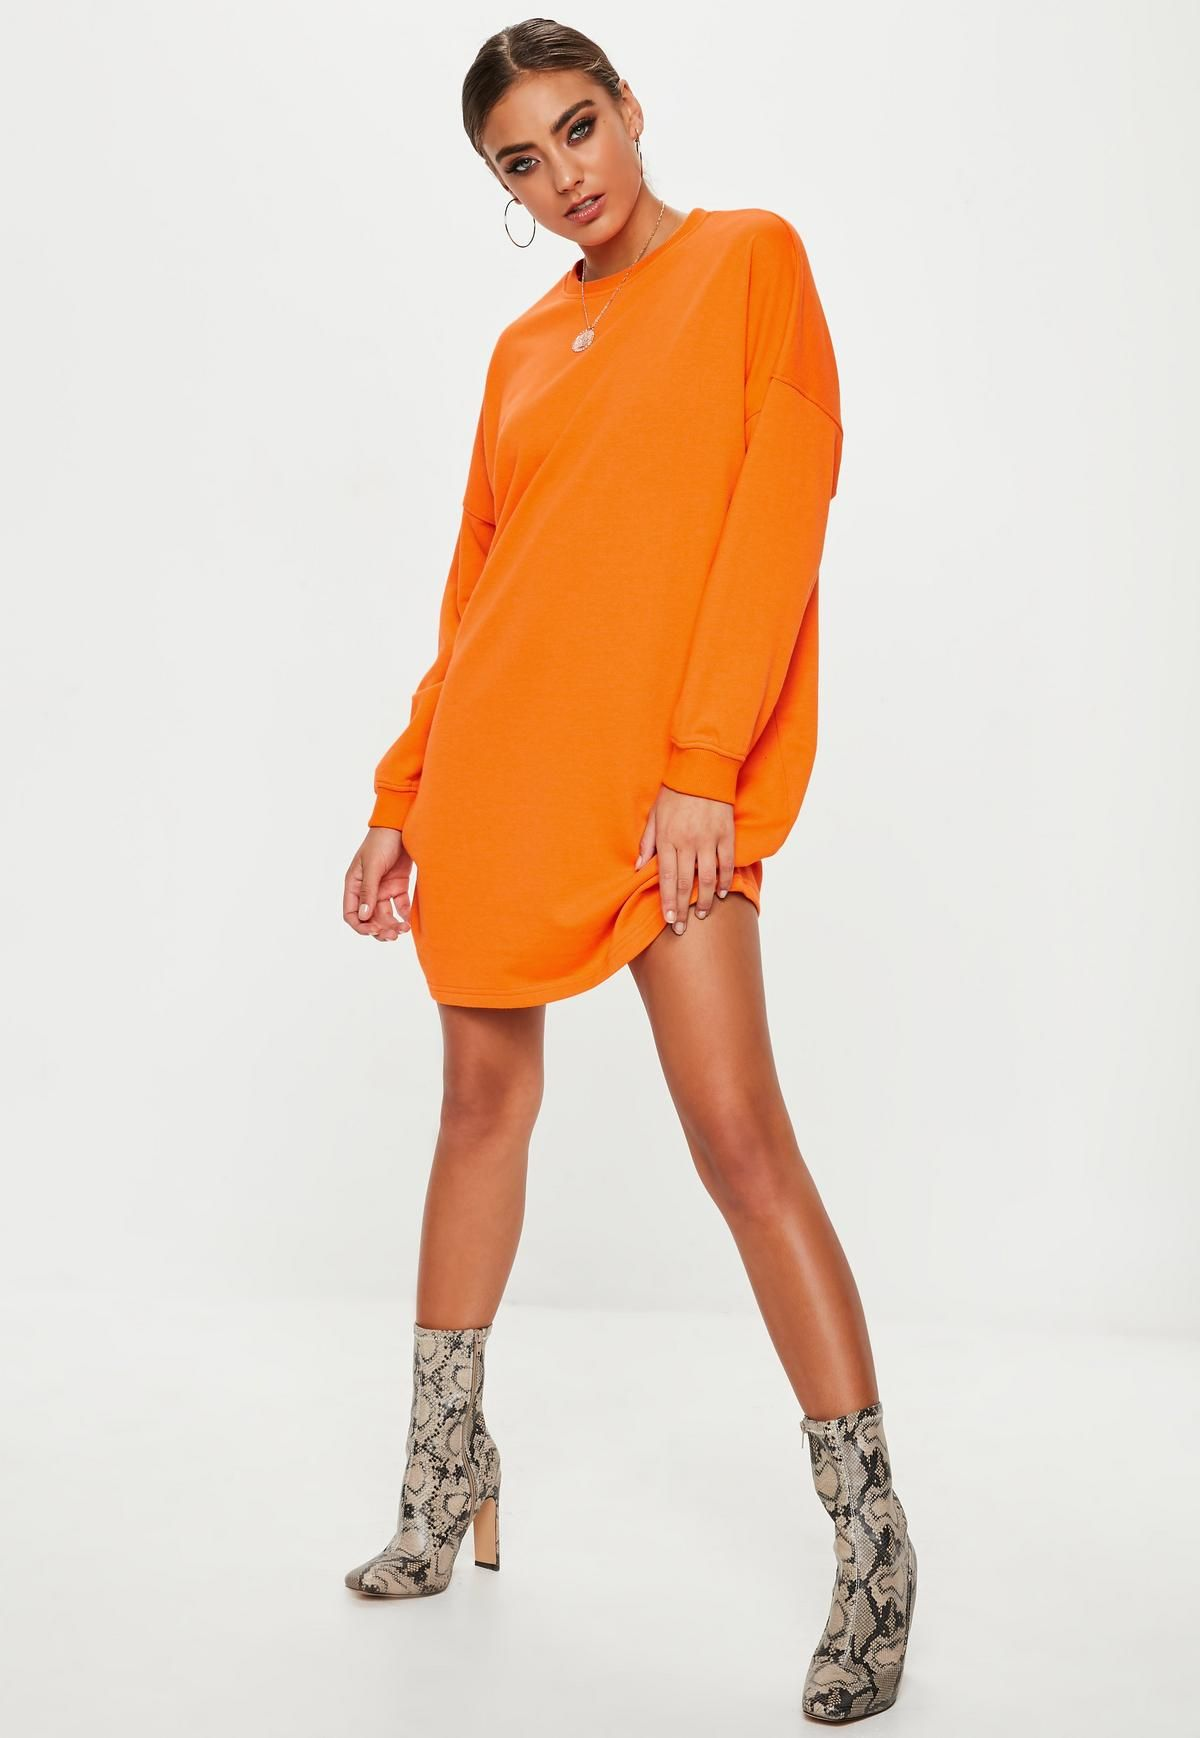 450c1a5024d7f1 Orange Crew Neck Oversized Sweater Dress | Missguided | Wardrobe ...